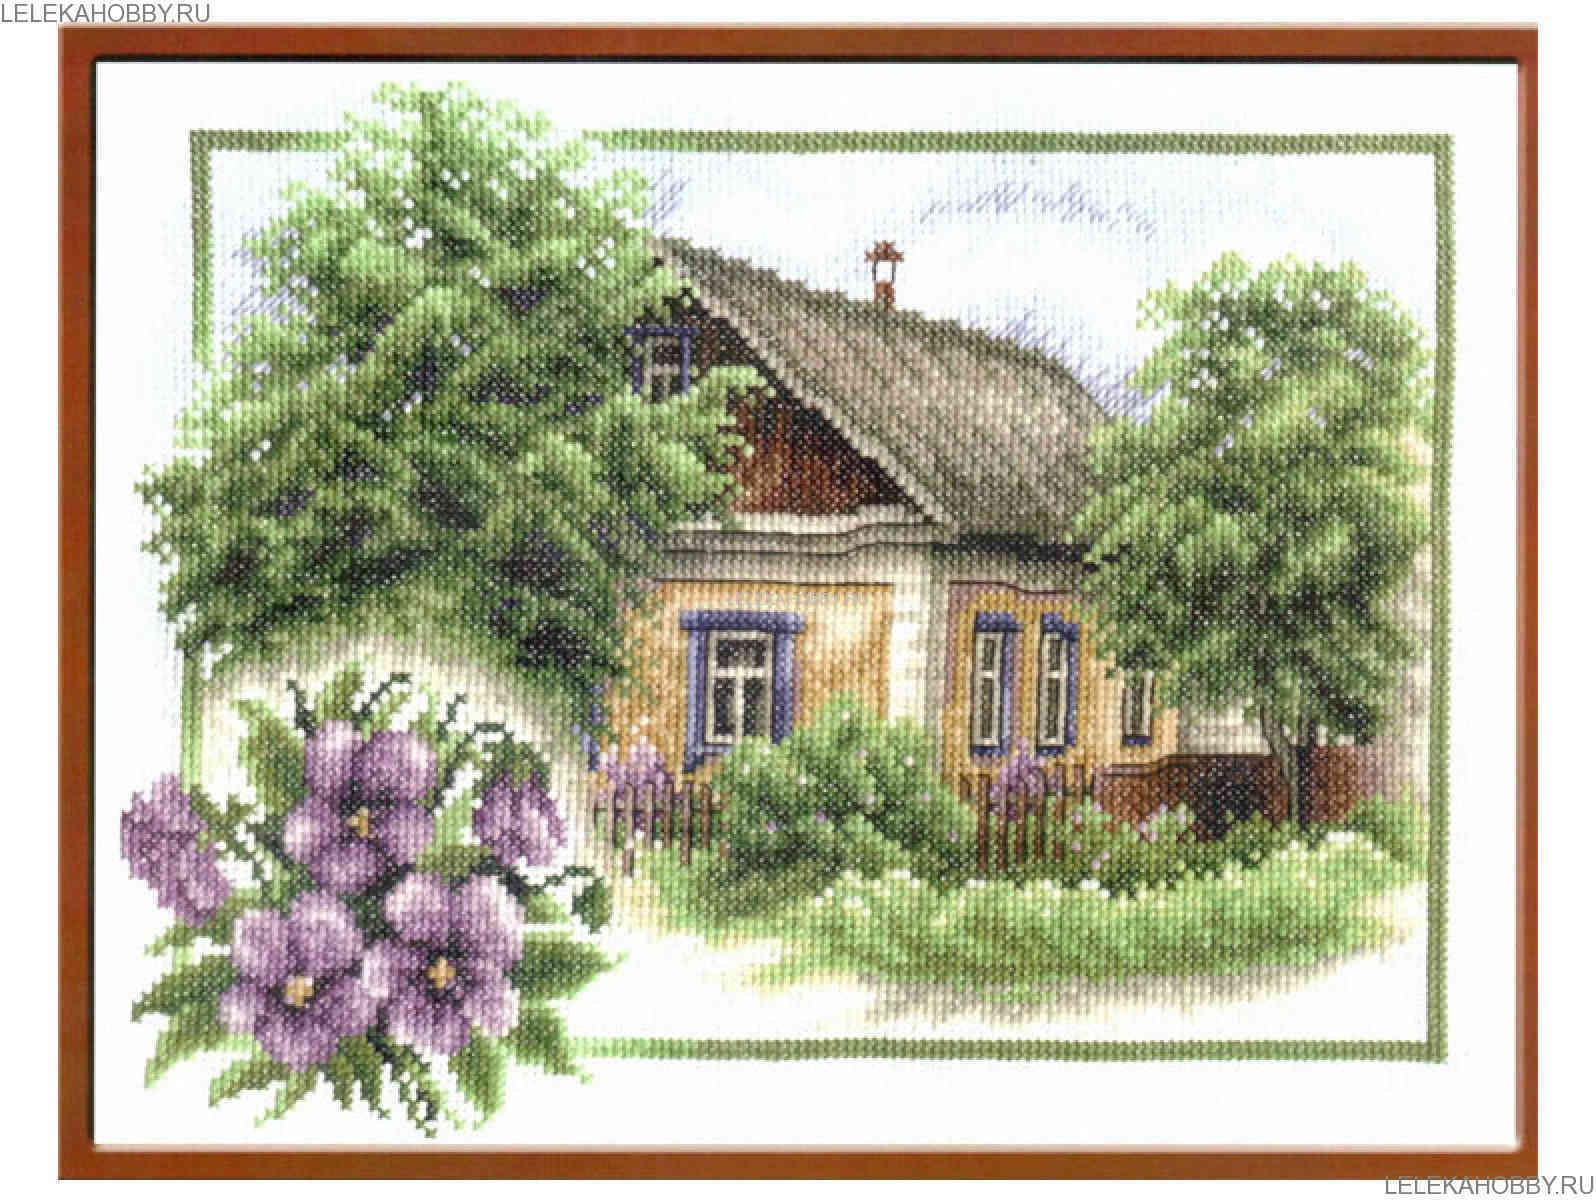 Моя деревня вышивка лето 938